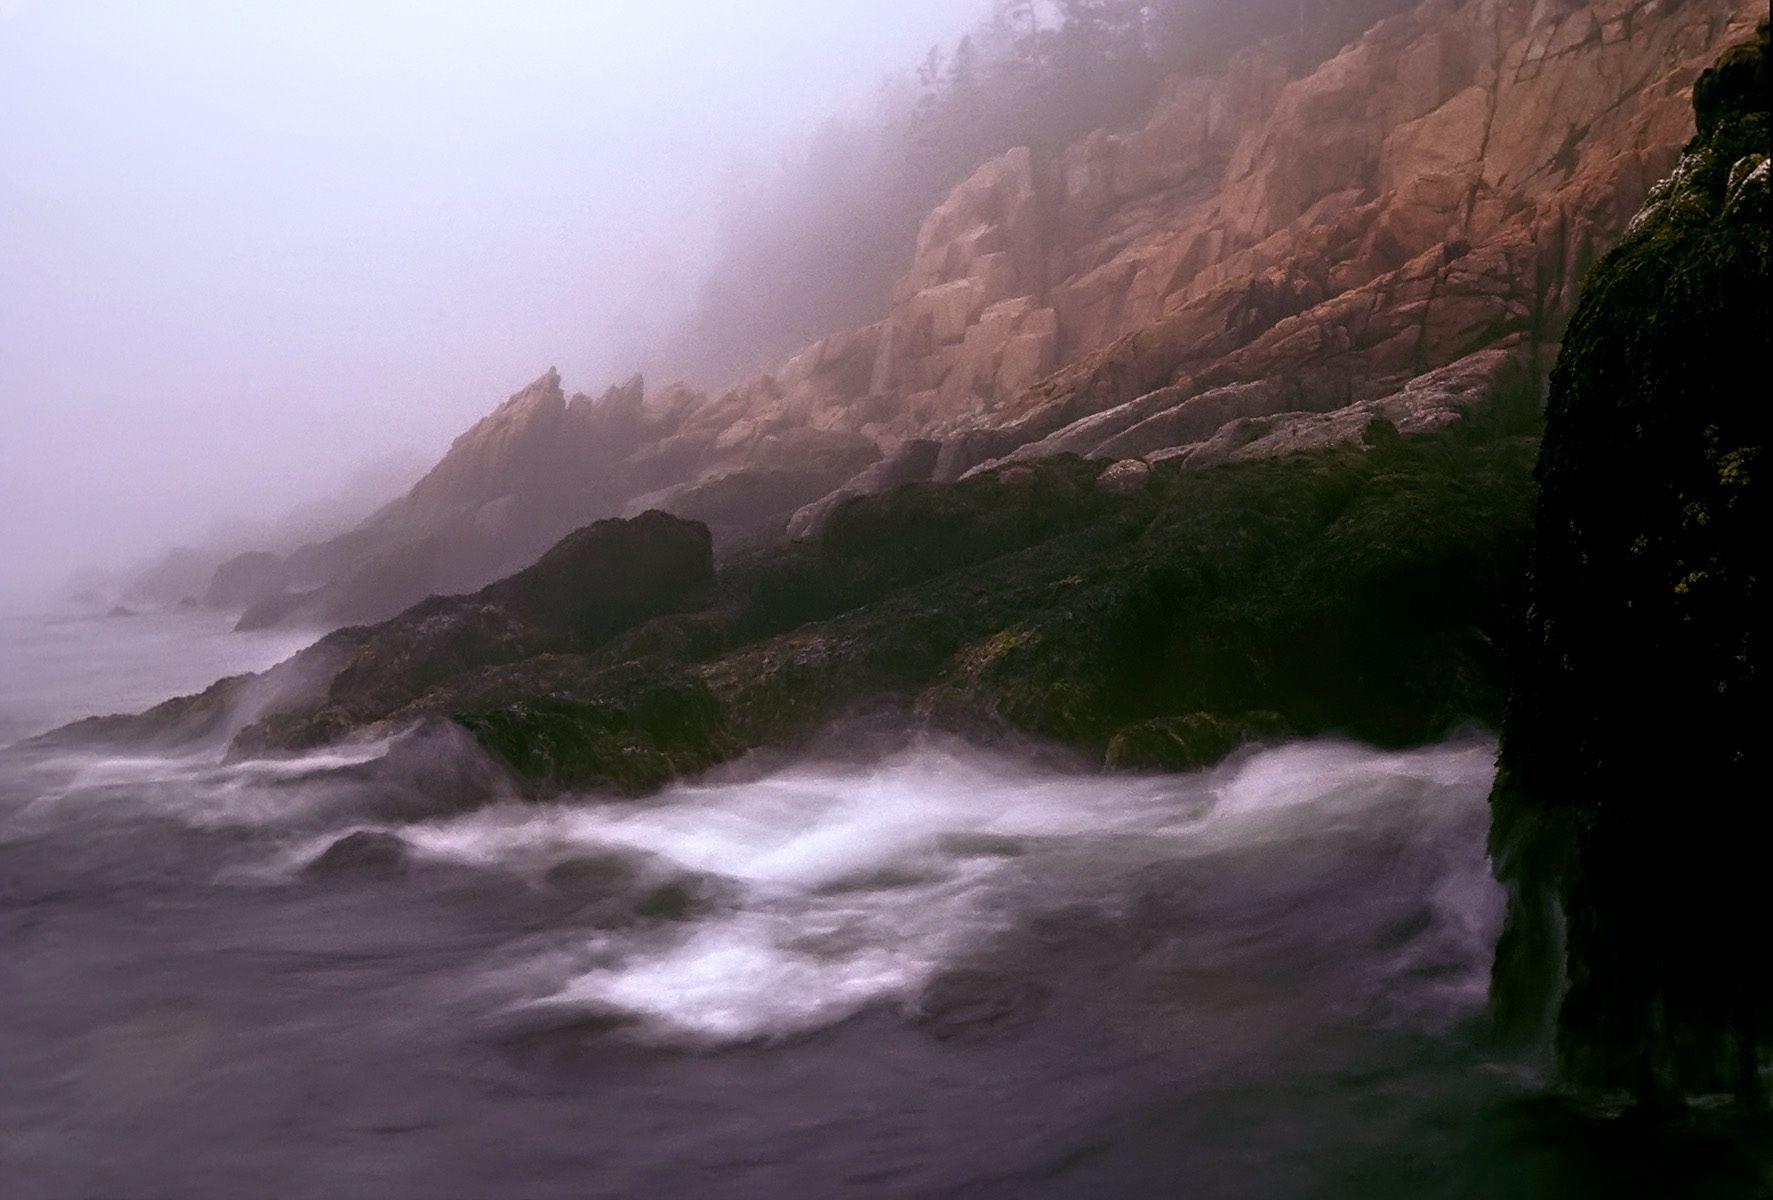 Acadia National Park, Mt. Desert Island, Maine